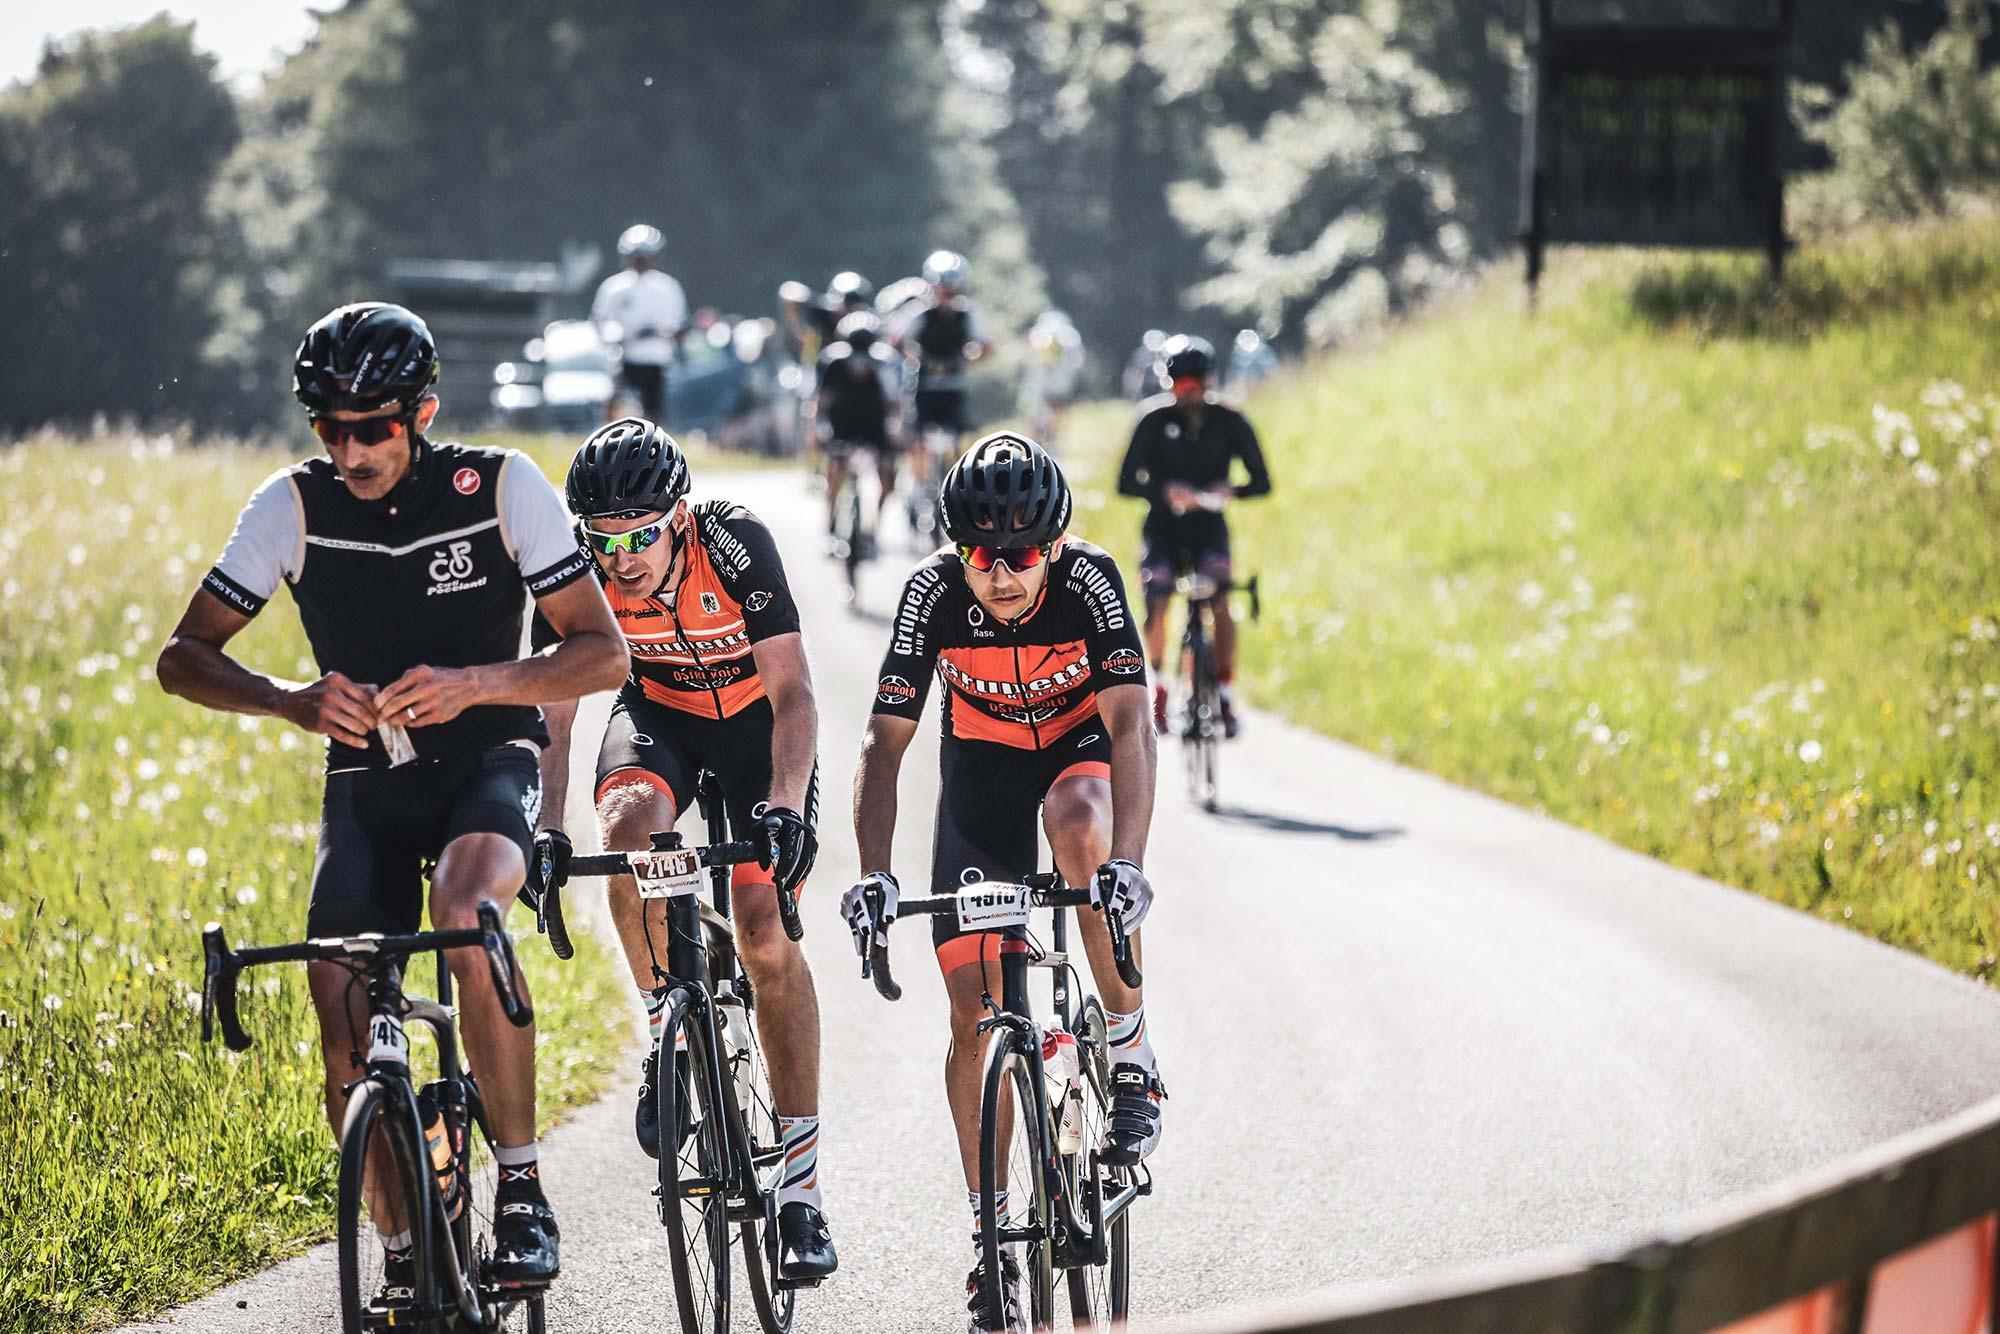 Grupetto Gorlice cycling team